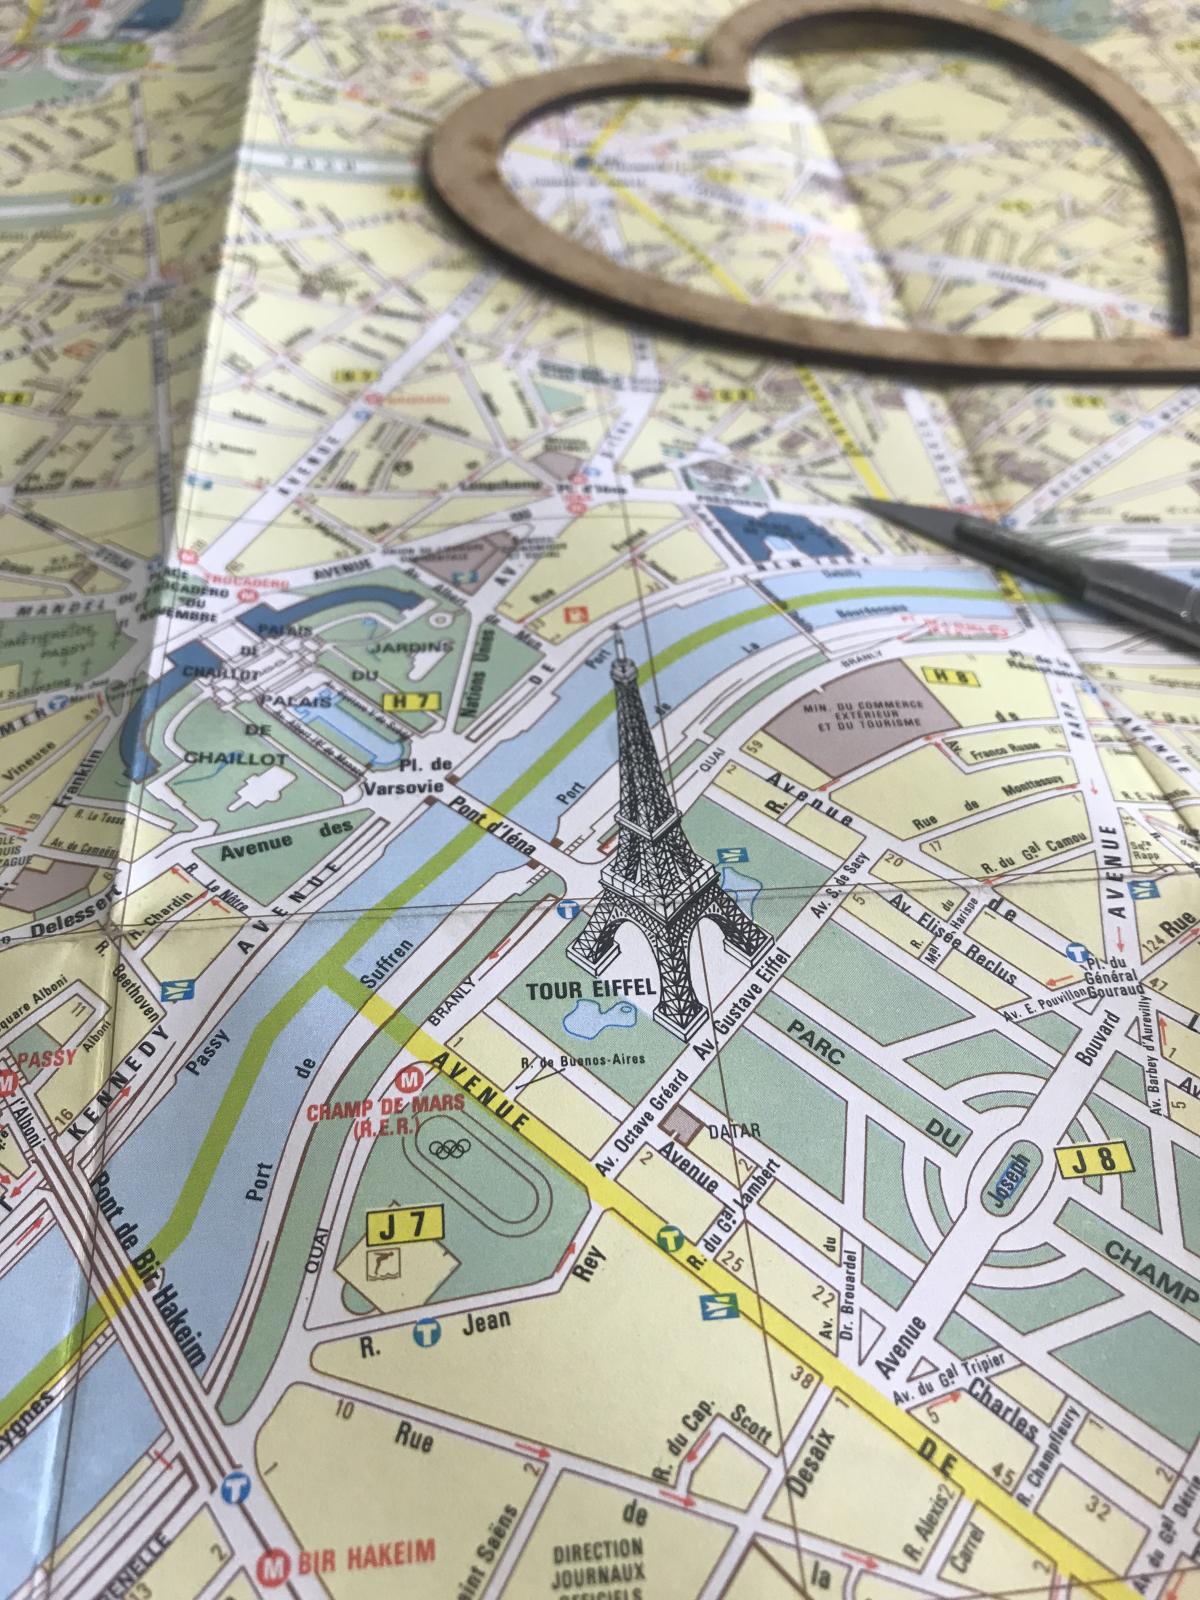 Bombus map of Paris, France. Taken in the Bombus studio during production